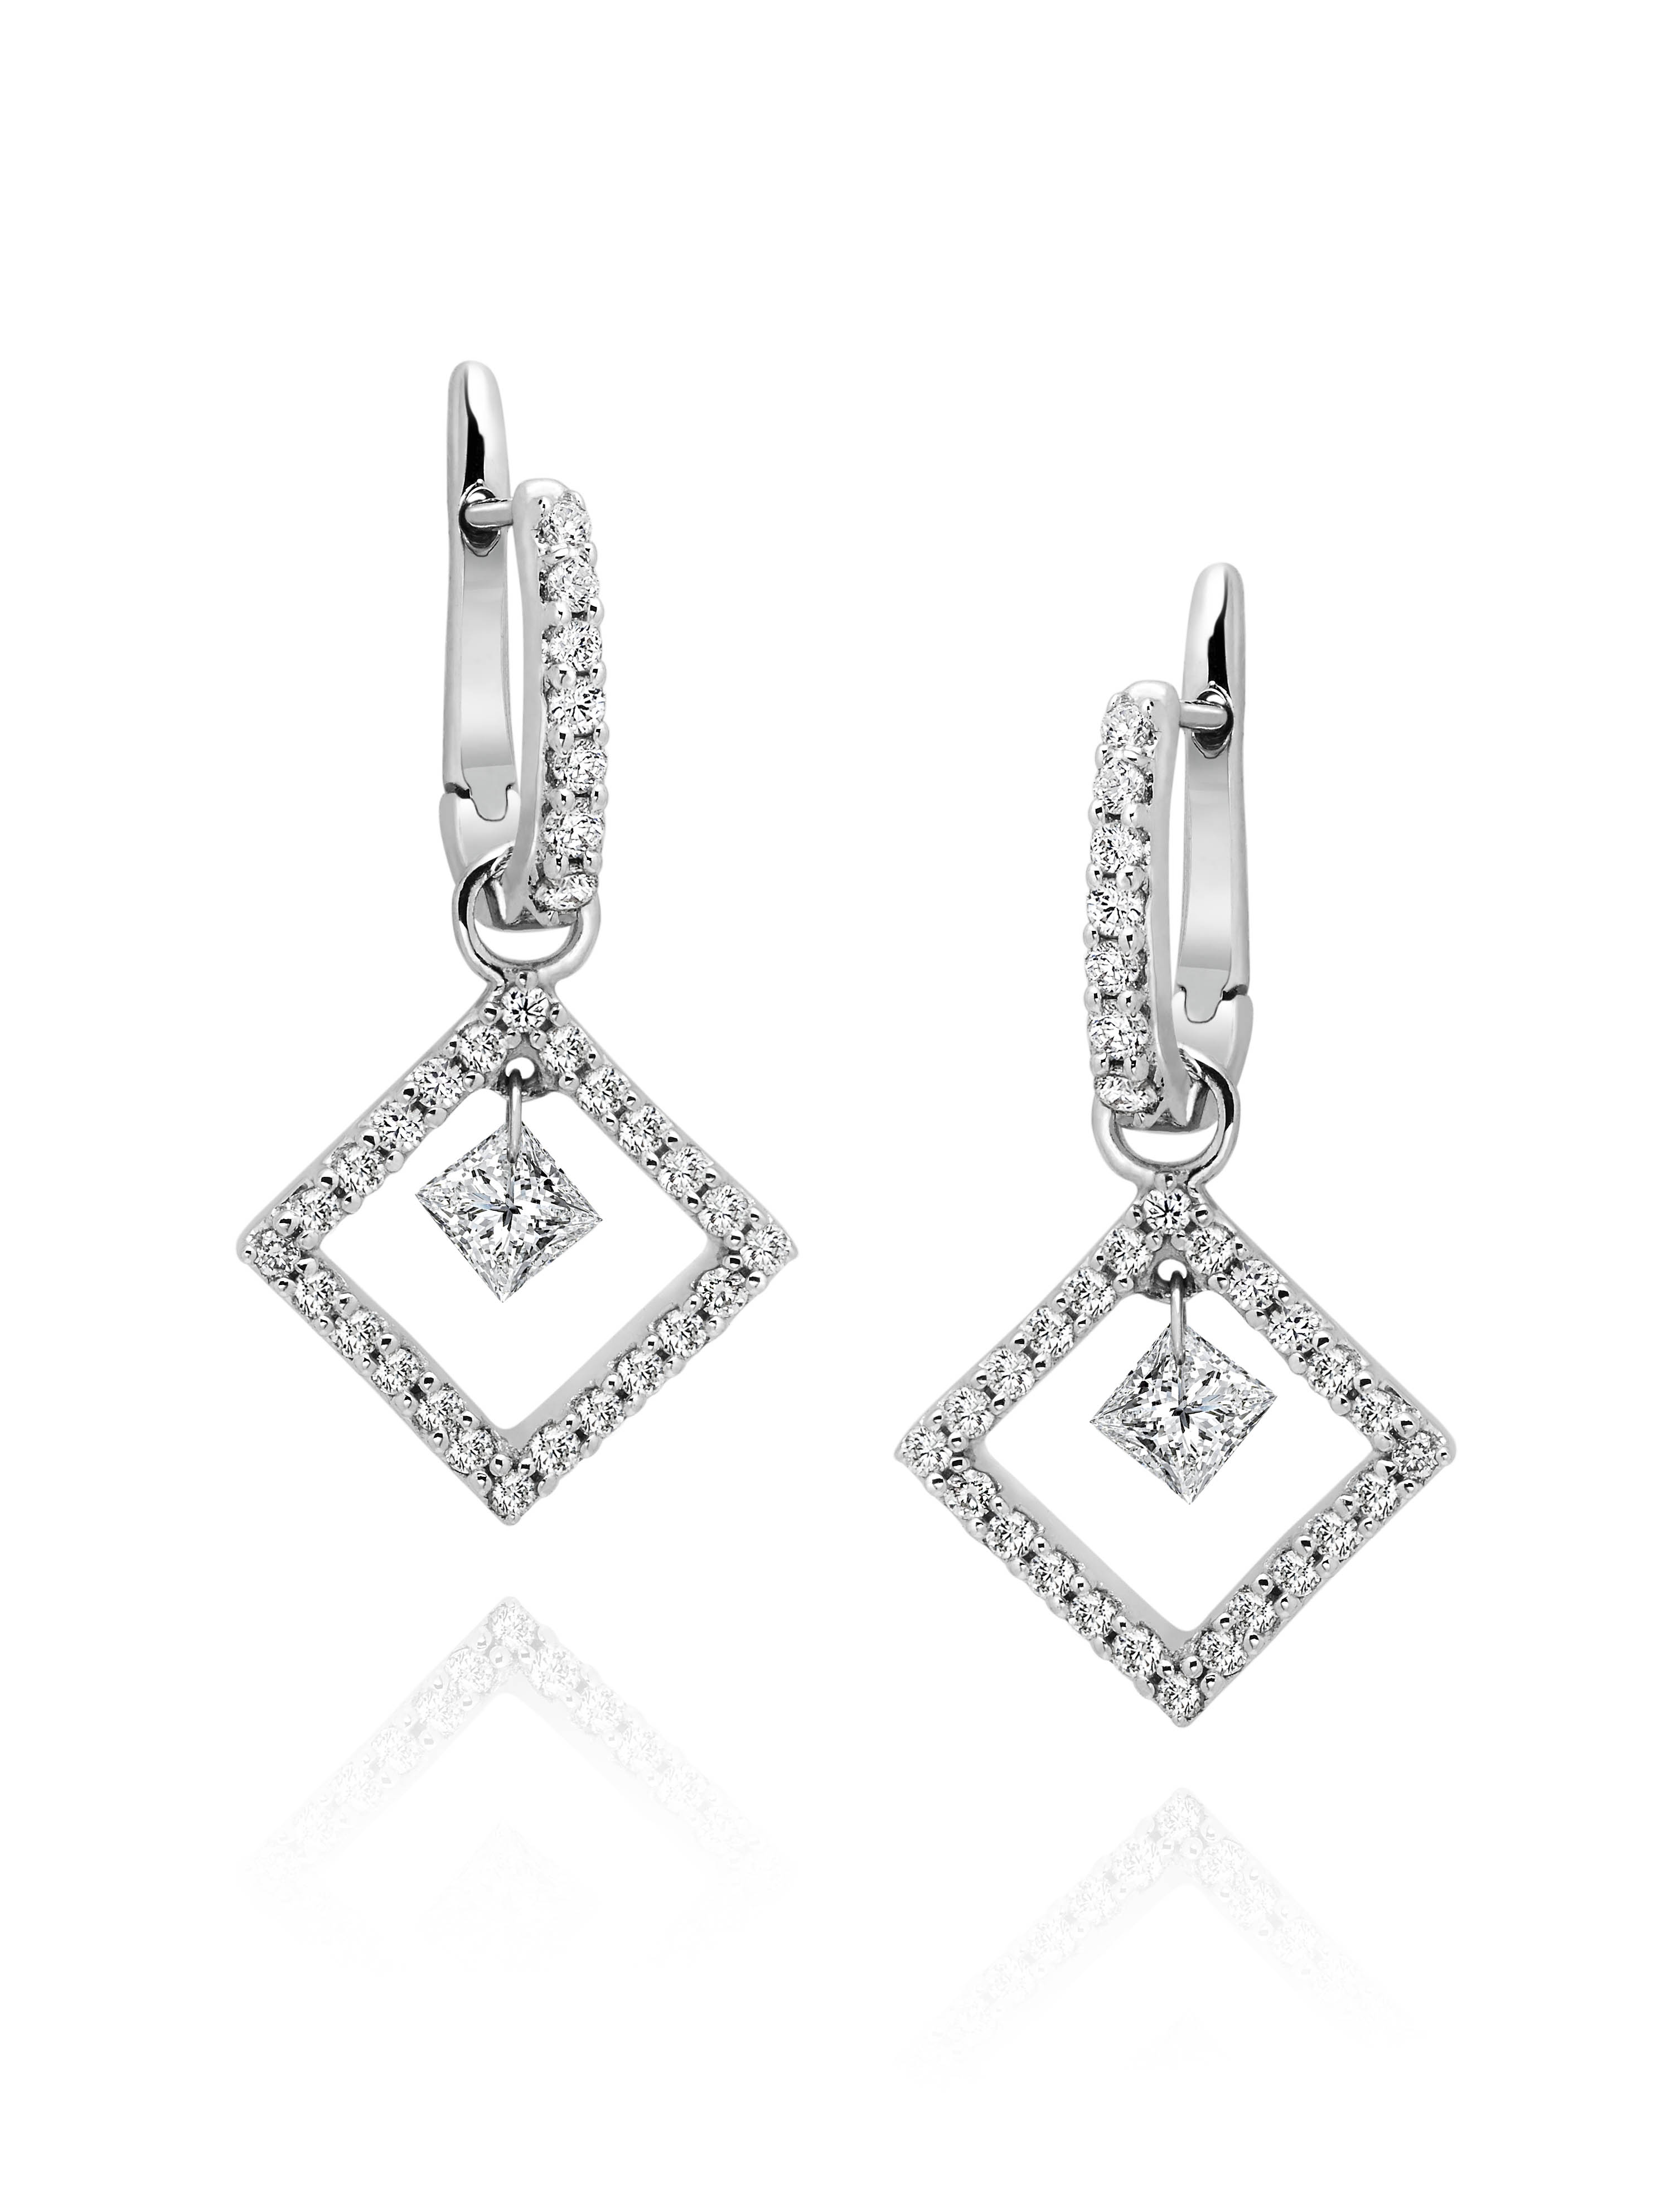 Floating Diamond Earrings 5 8cttw Sbt Imports